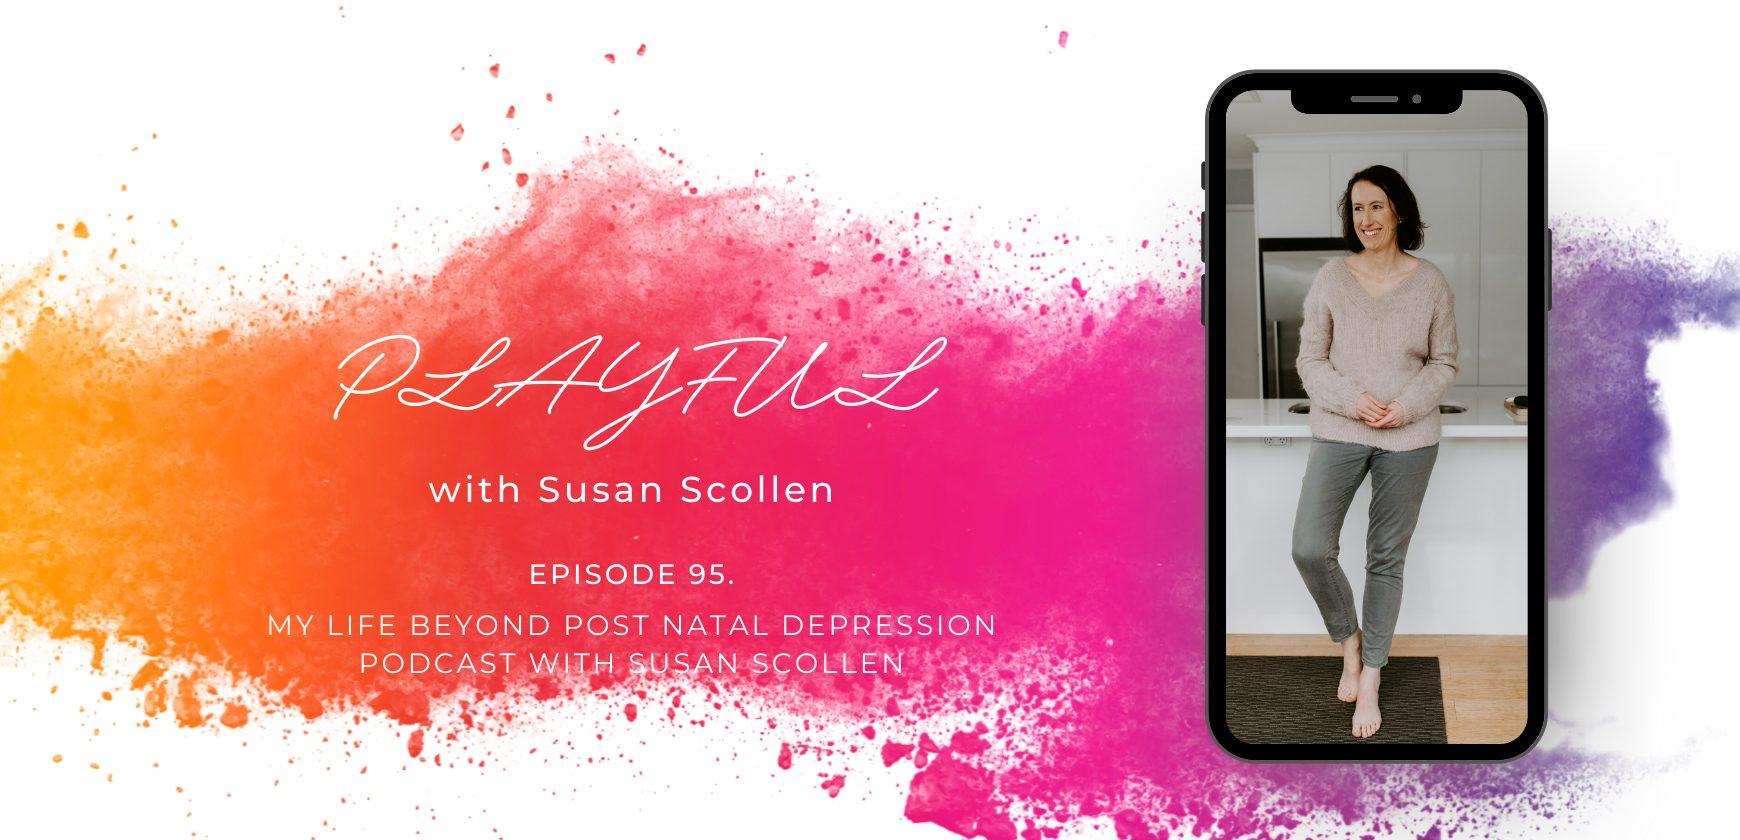 PLAYFUL with Susan Scollen